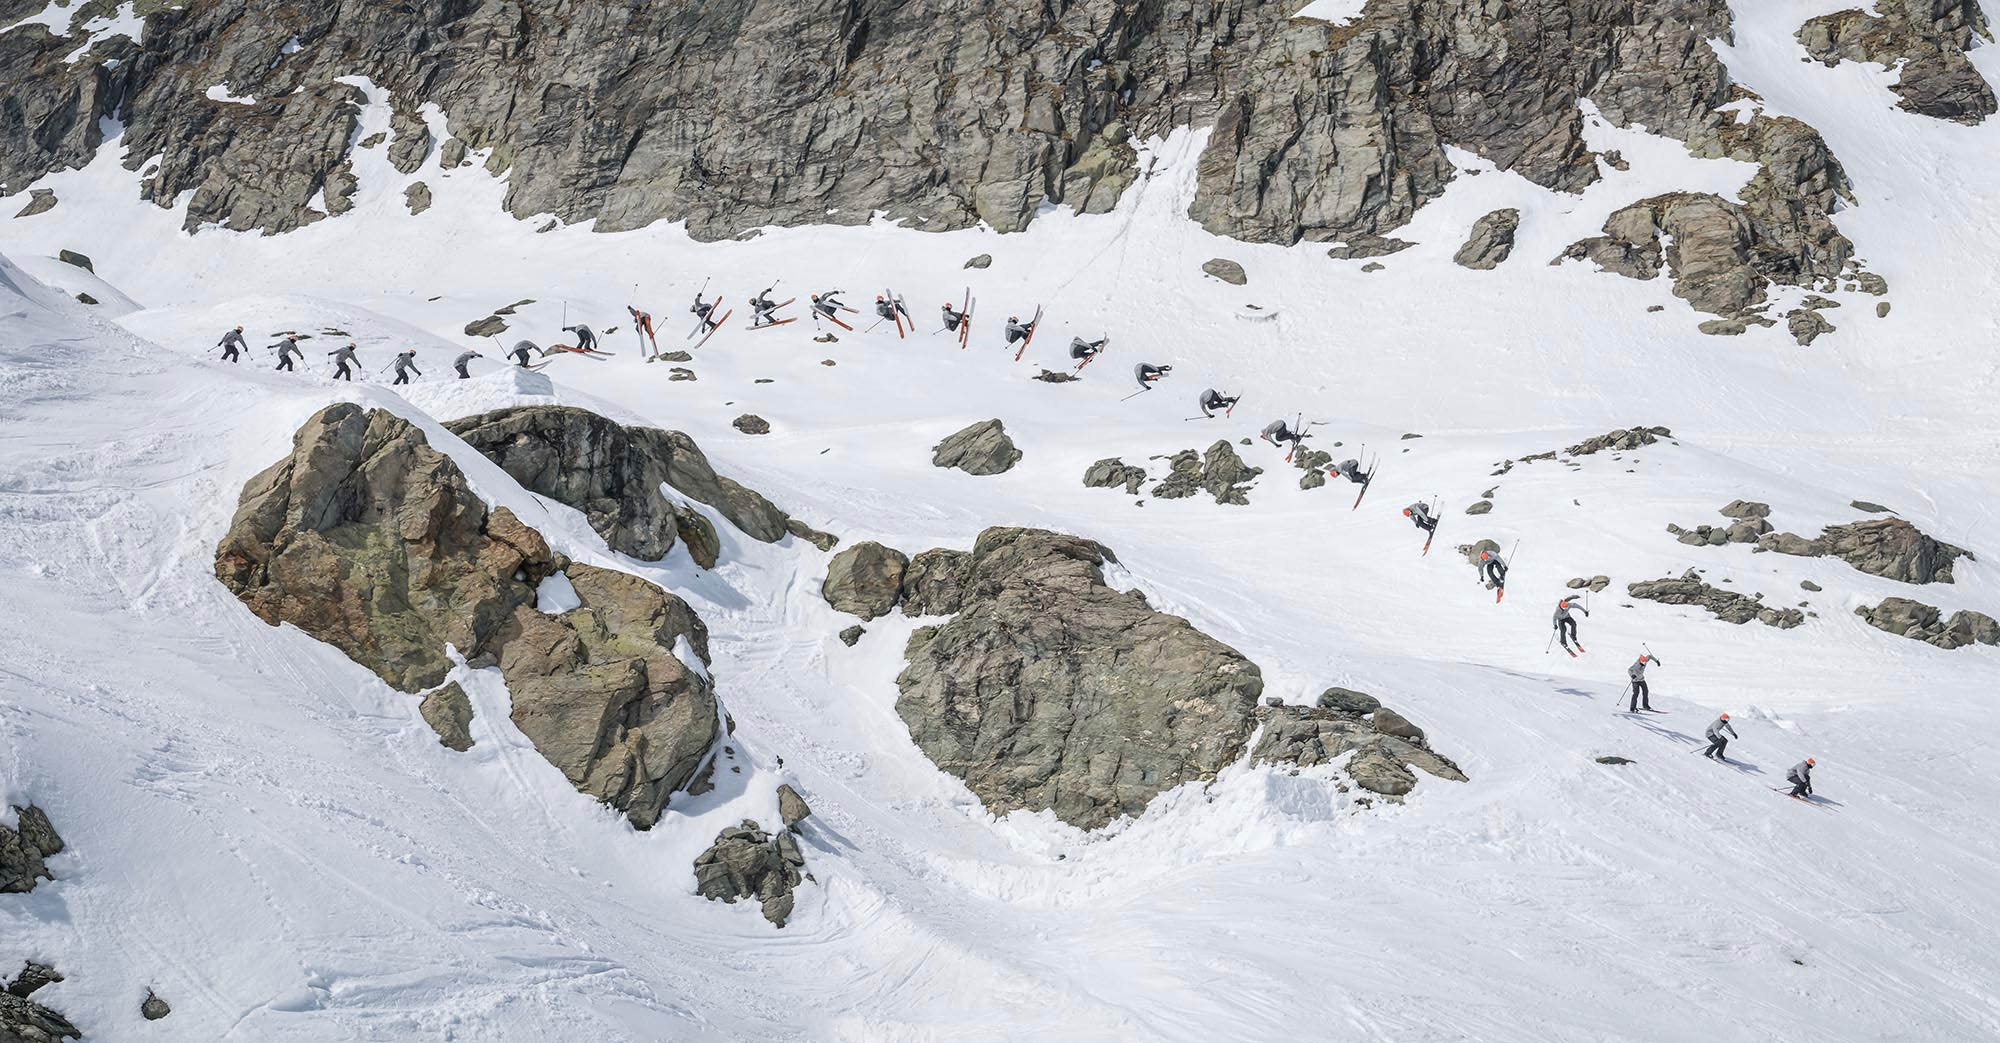 Tim McChesney zimmert an diesem Kicker einen massiven Cork 7 Japan in das Backcountry - Foto: Tristan Shu